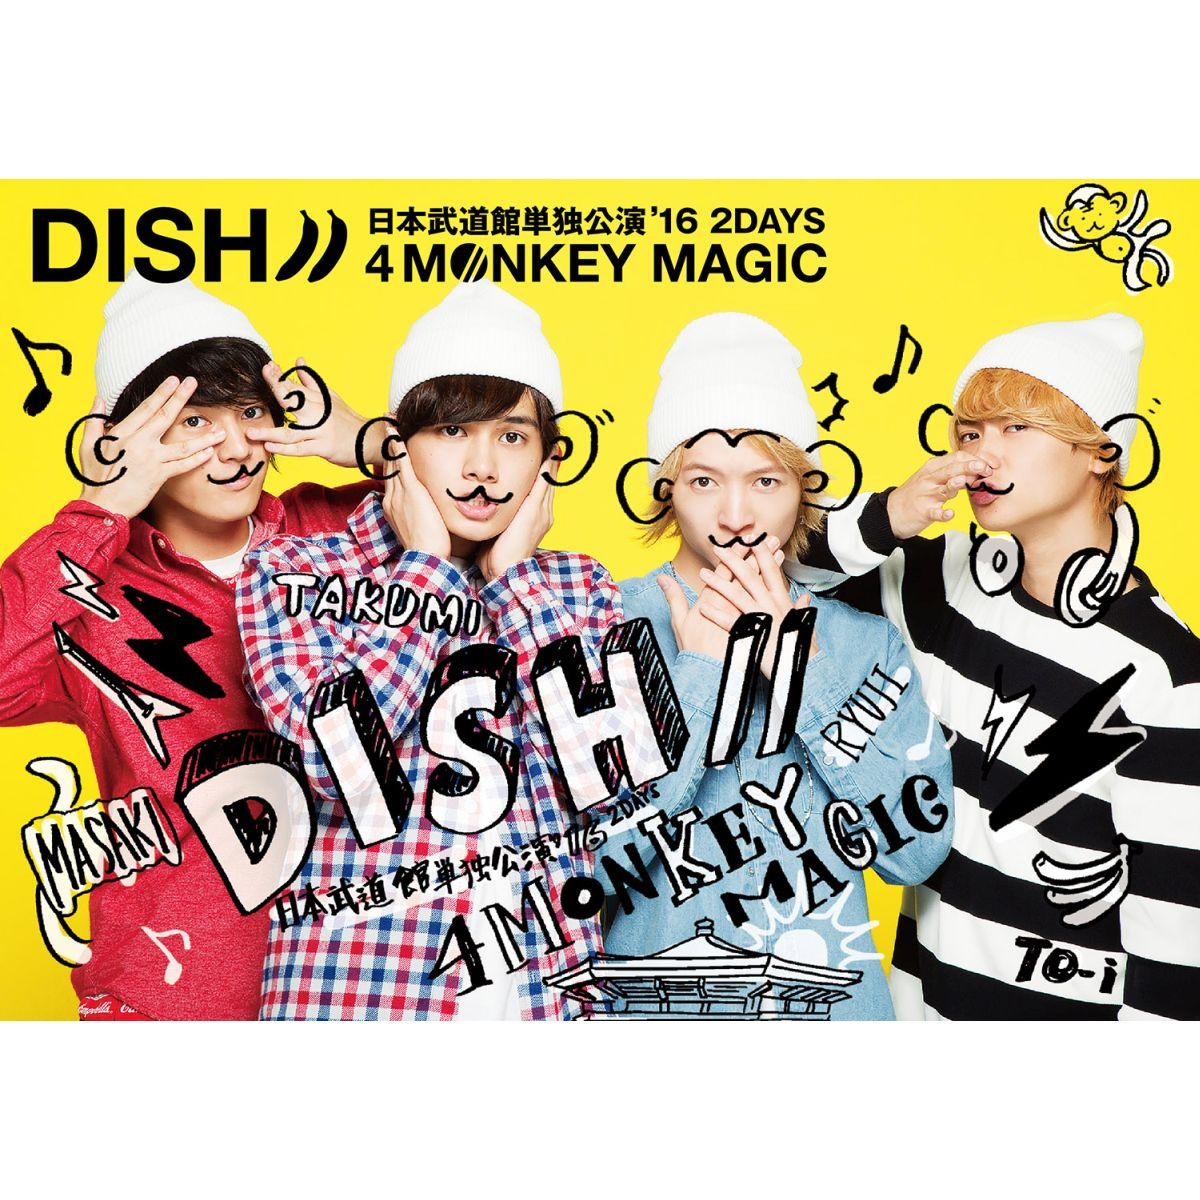 DISH// 日本武道館単独公演 '16 2DAYS 『4 MONKEY MAGIC』【Blu-ray】画像